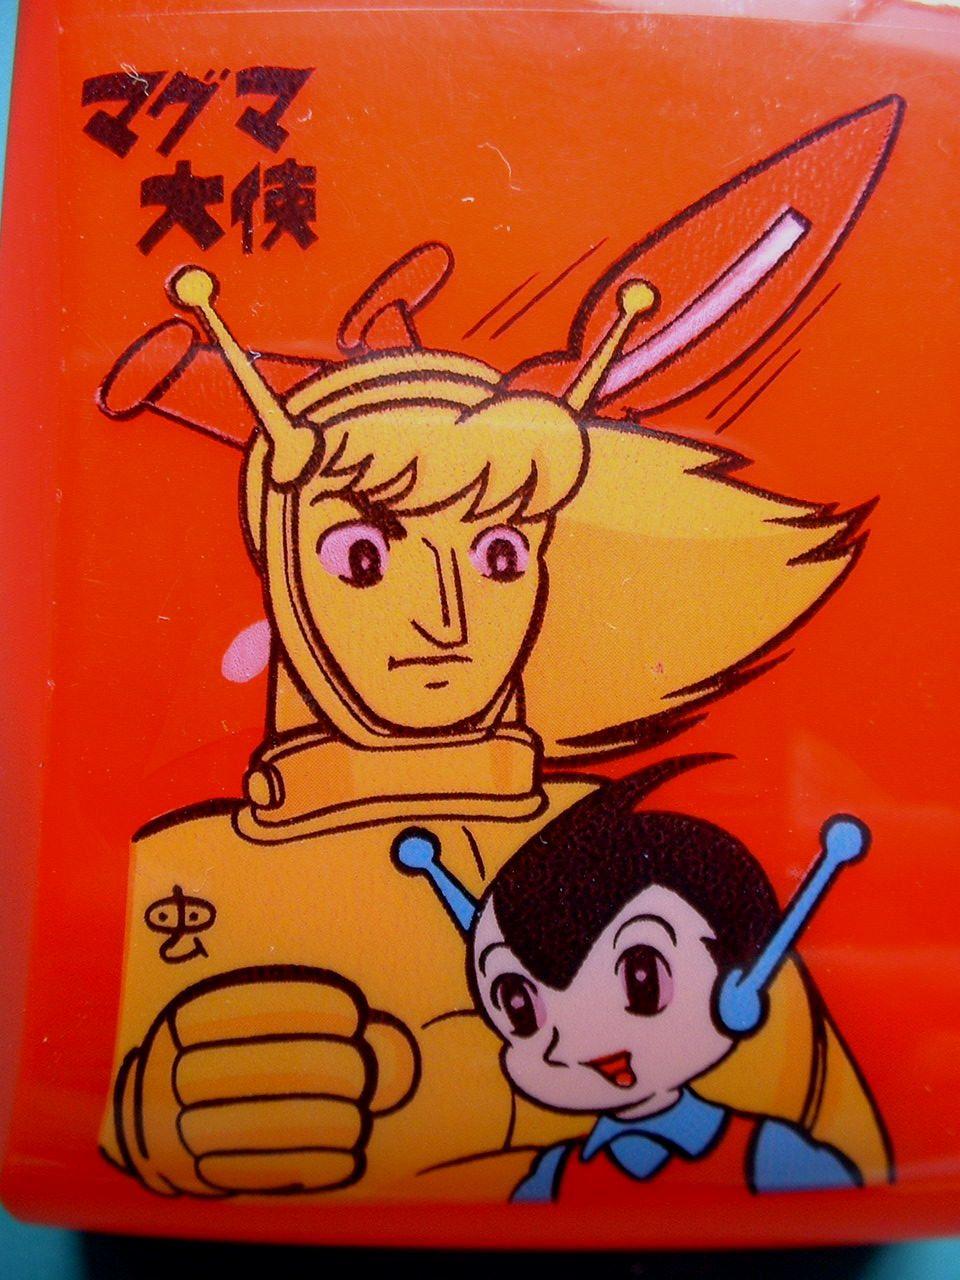 Toys cartoon images  Space GiantsMagma Taishi Toys  space giants  Pinterest  Sci fi